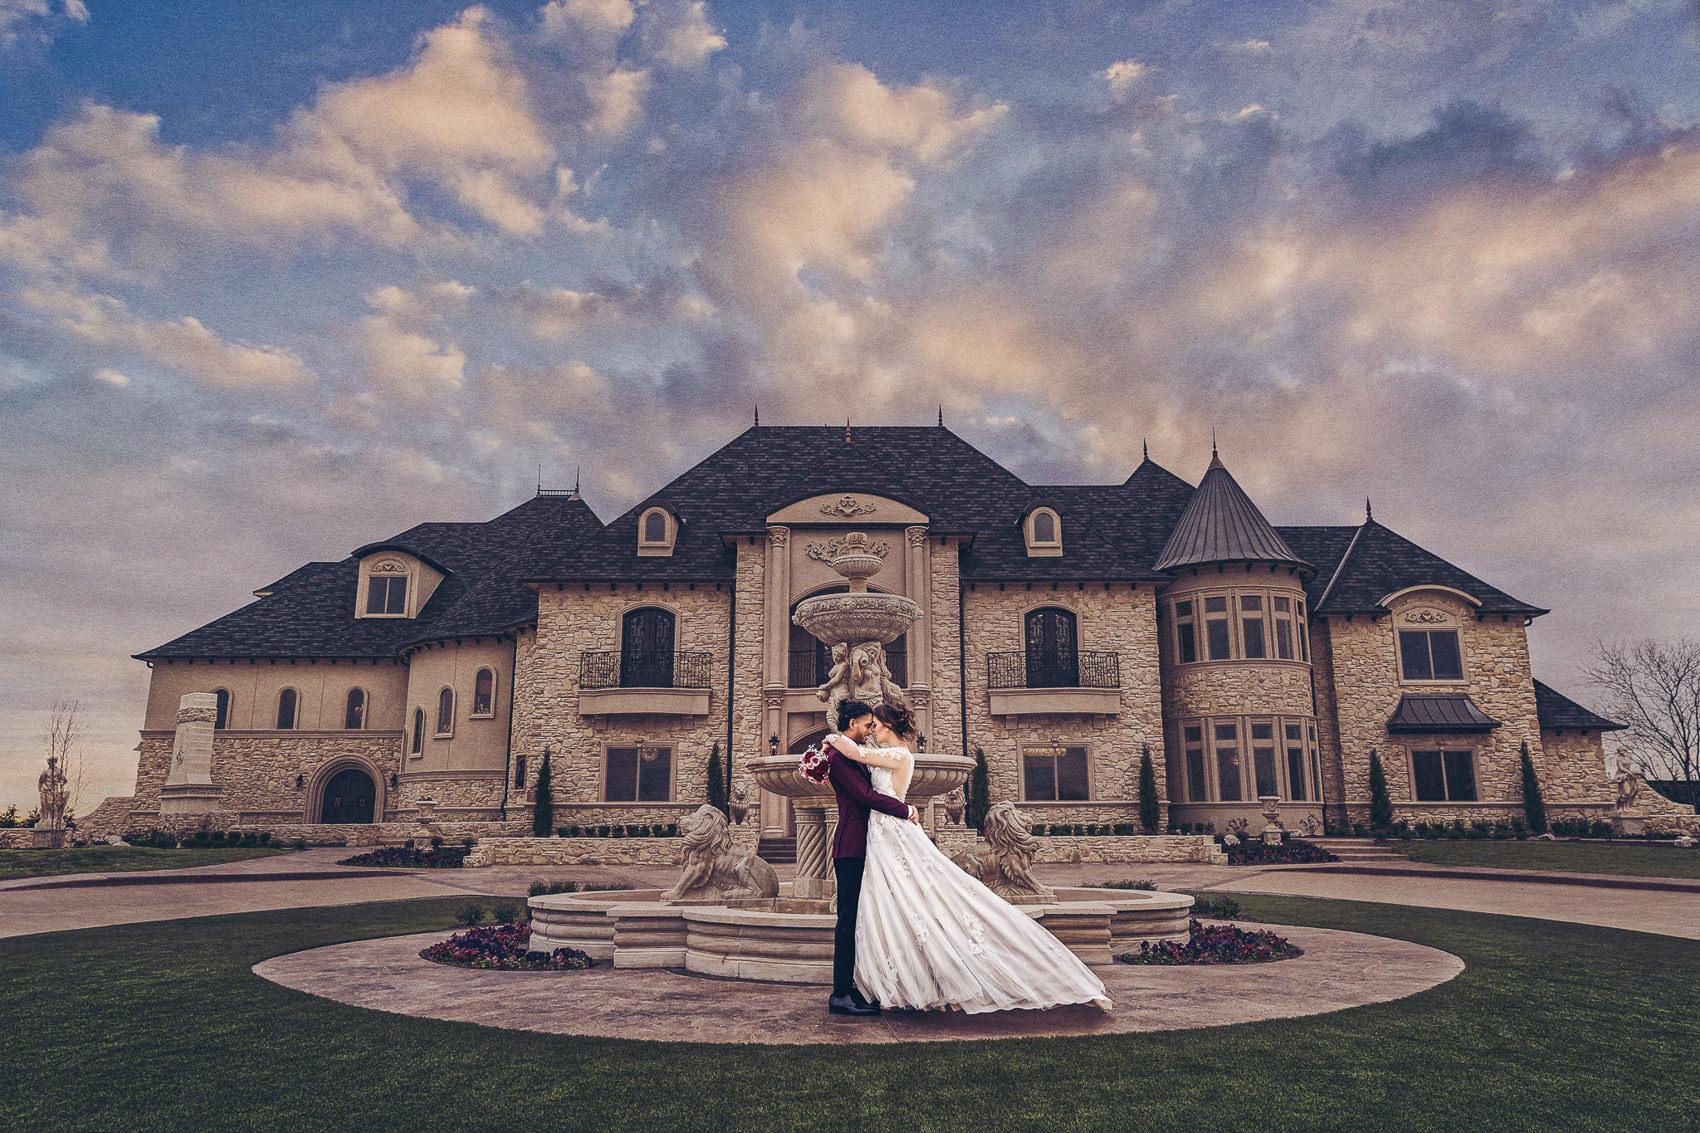 Knotting Hill Place Weddings Scott Aleman Photography-2